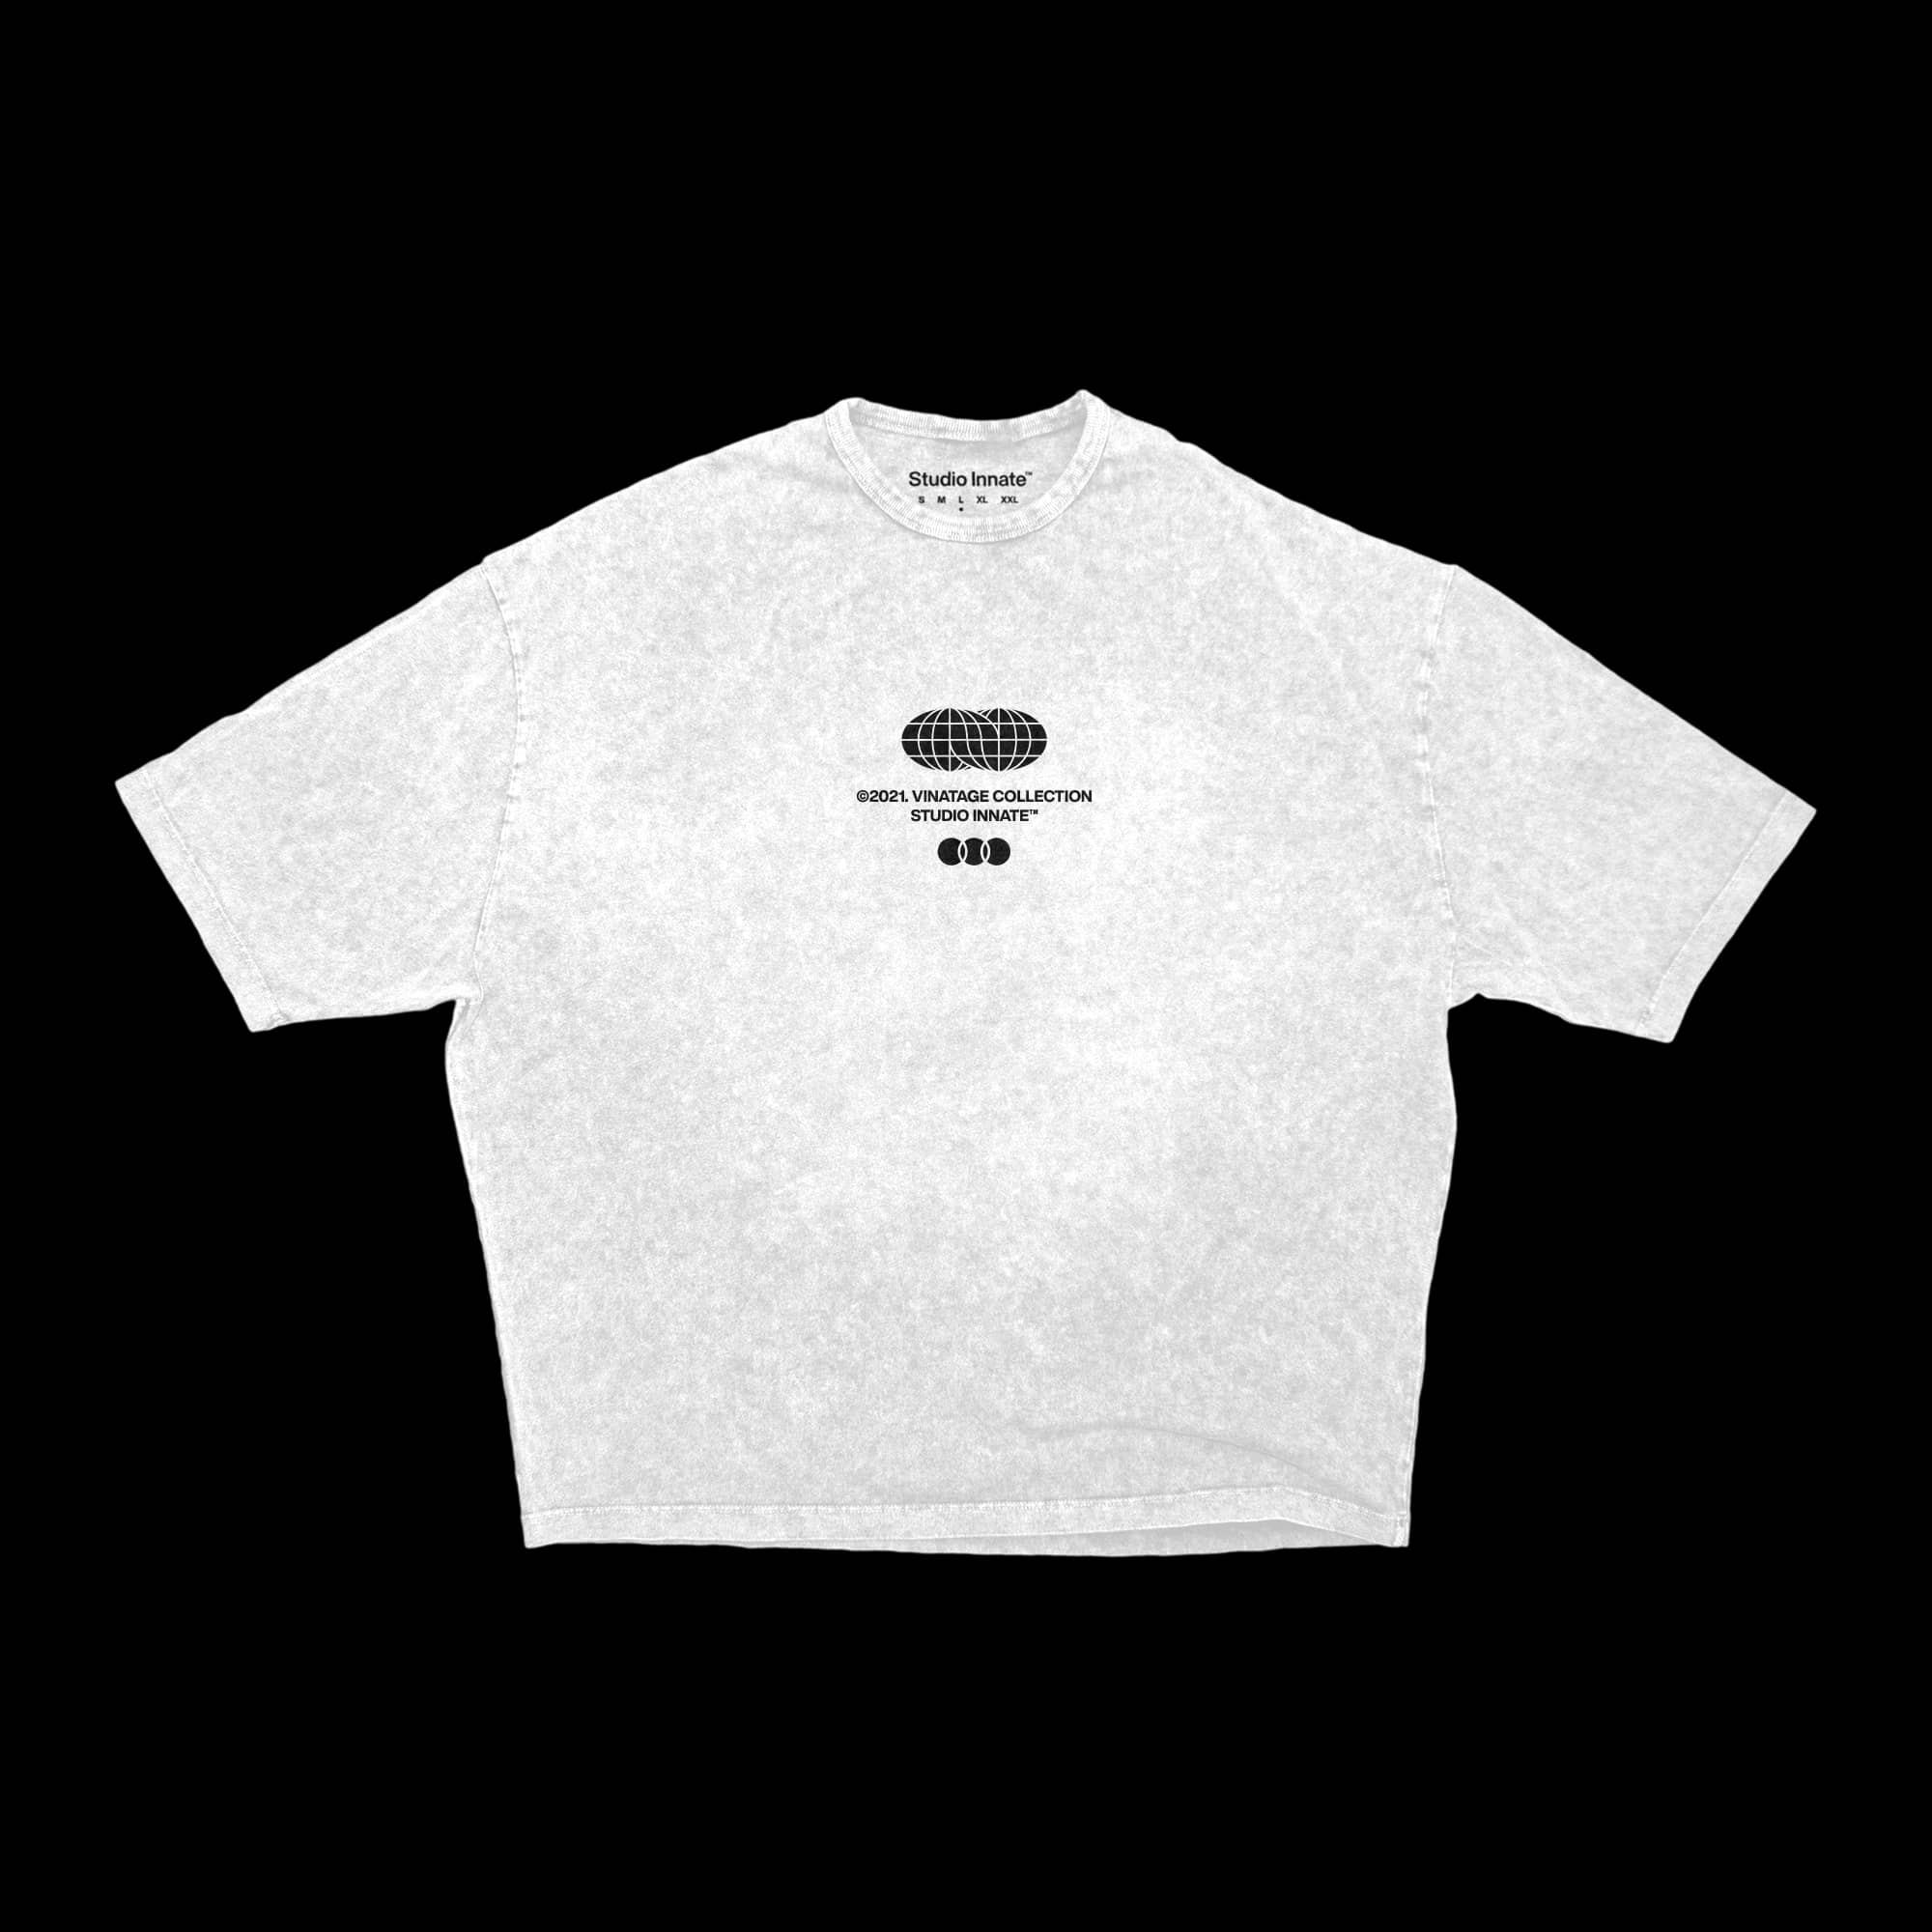 Oversized-Vintage_T-shirt-front-white